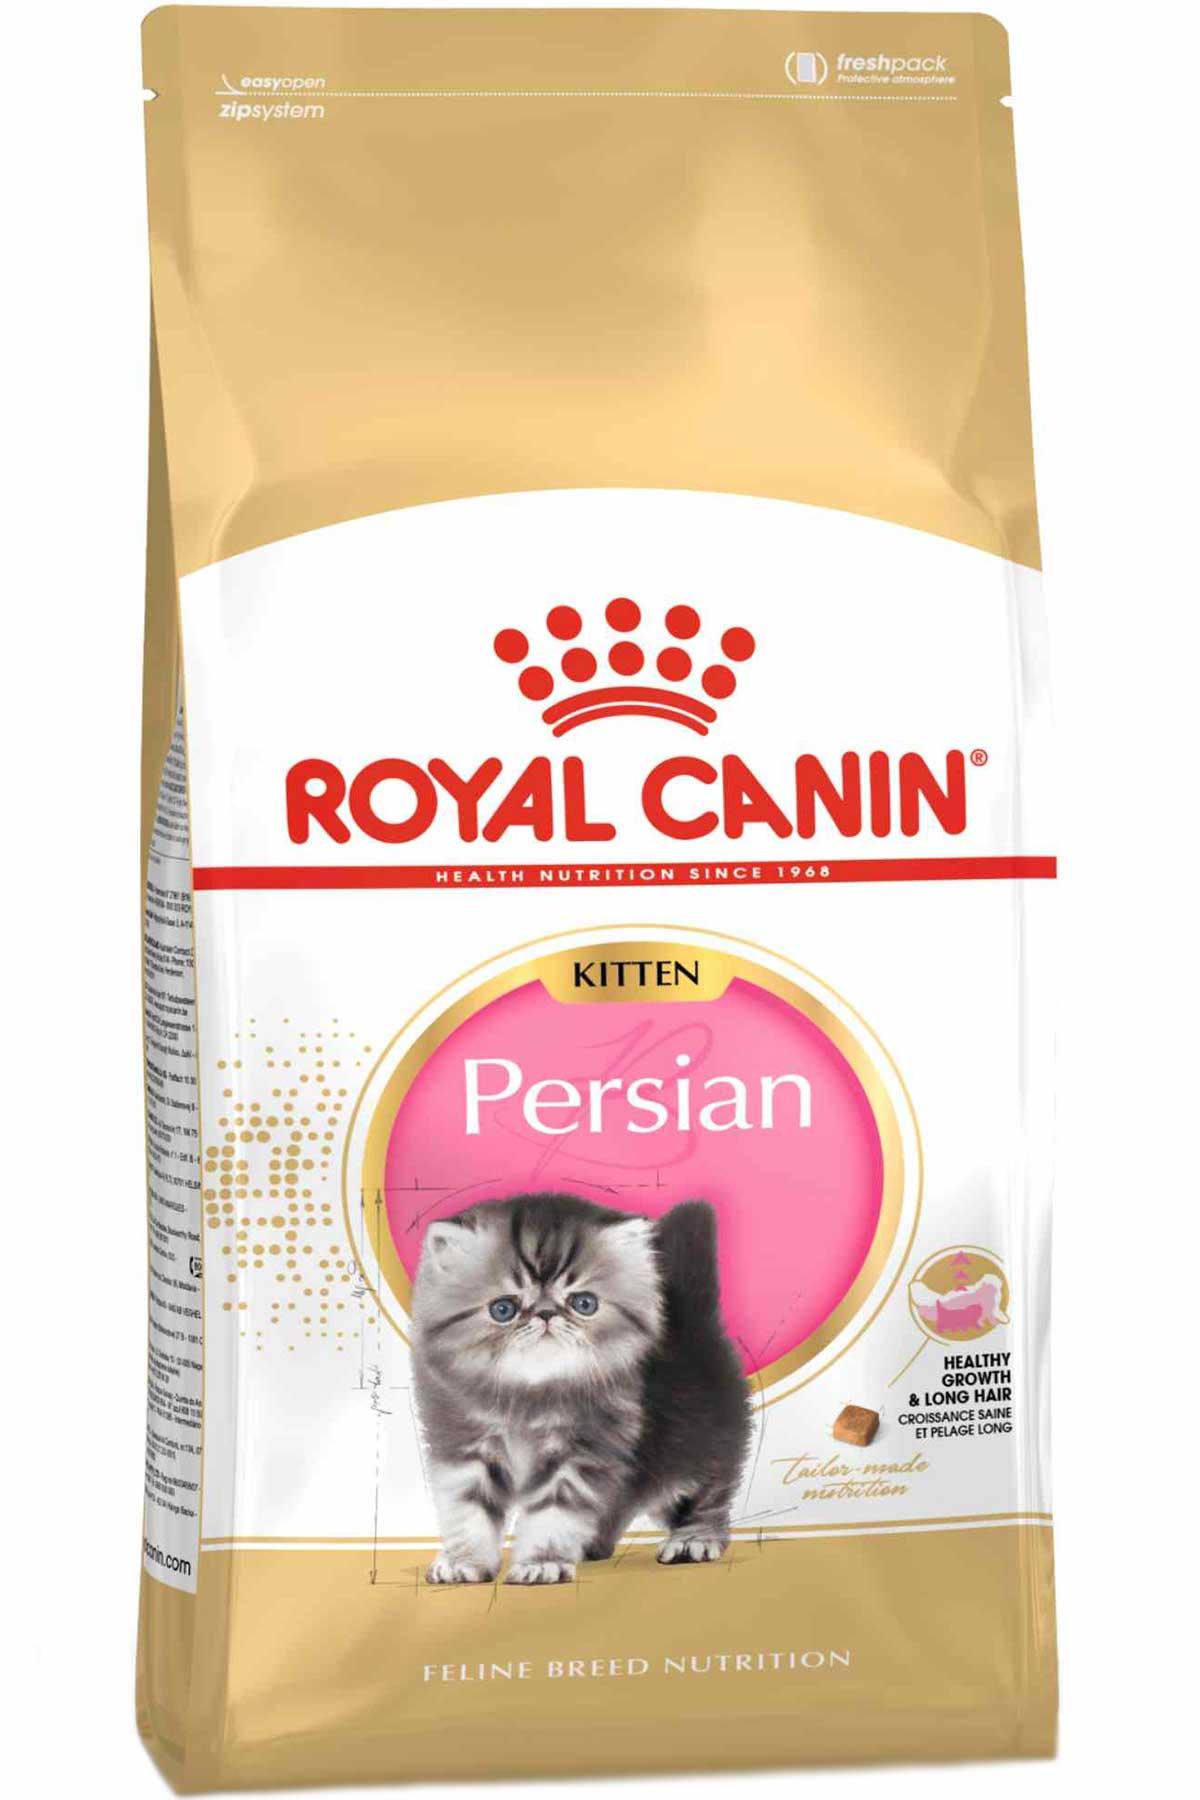 Royal Canin Persian Kitten İran Irkı Yavru Kedi Maması 2kg